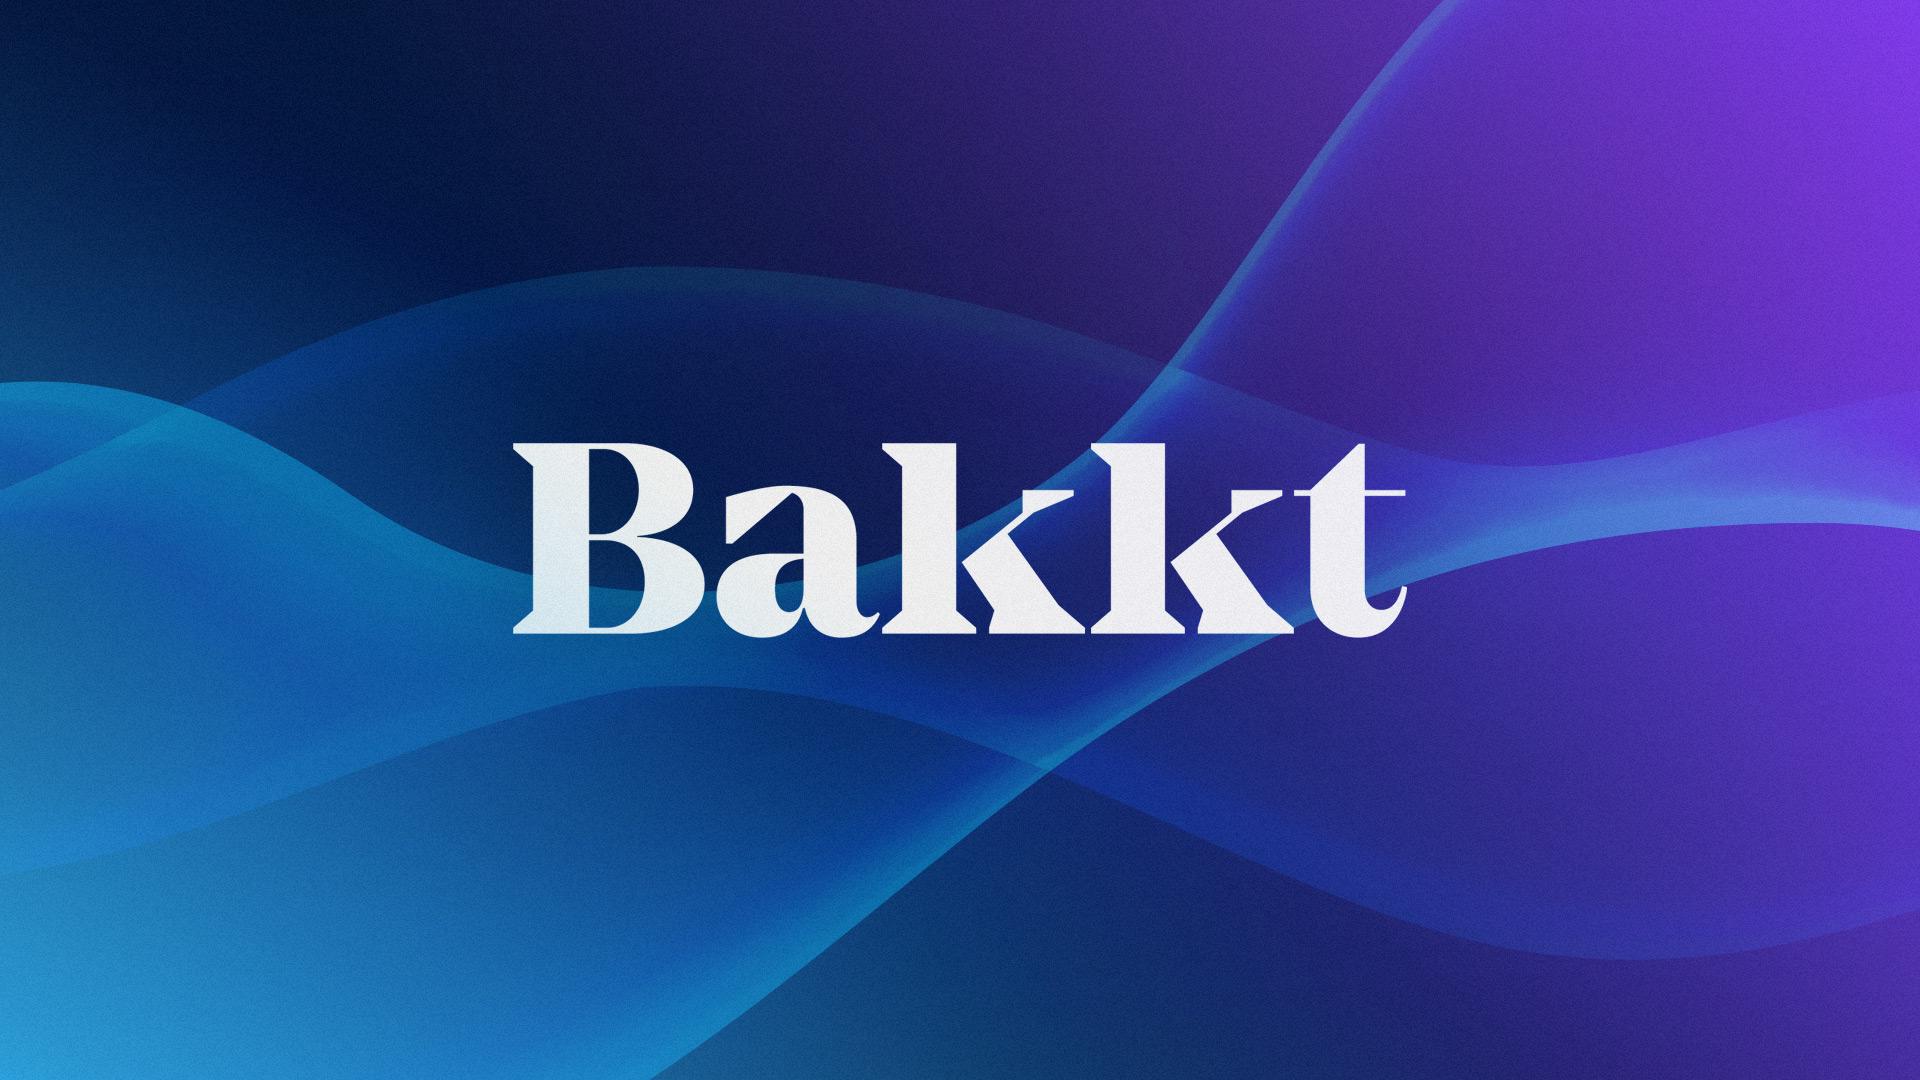 Bakkt confirms September launch date - The Block